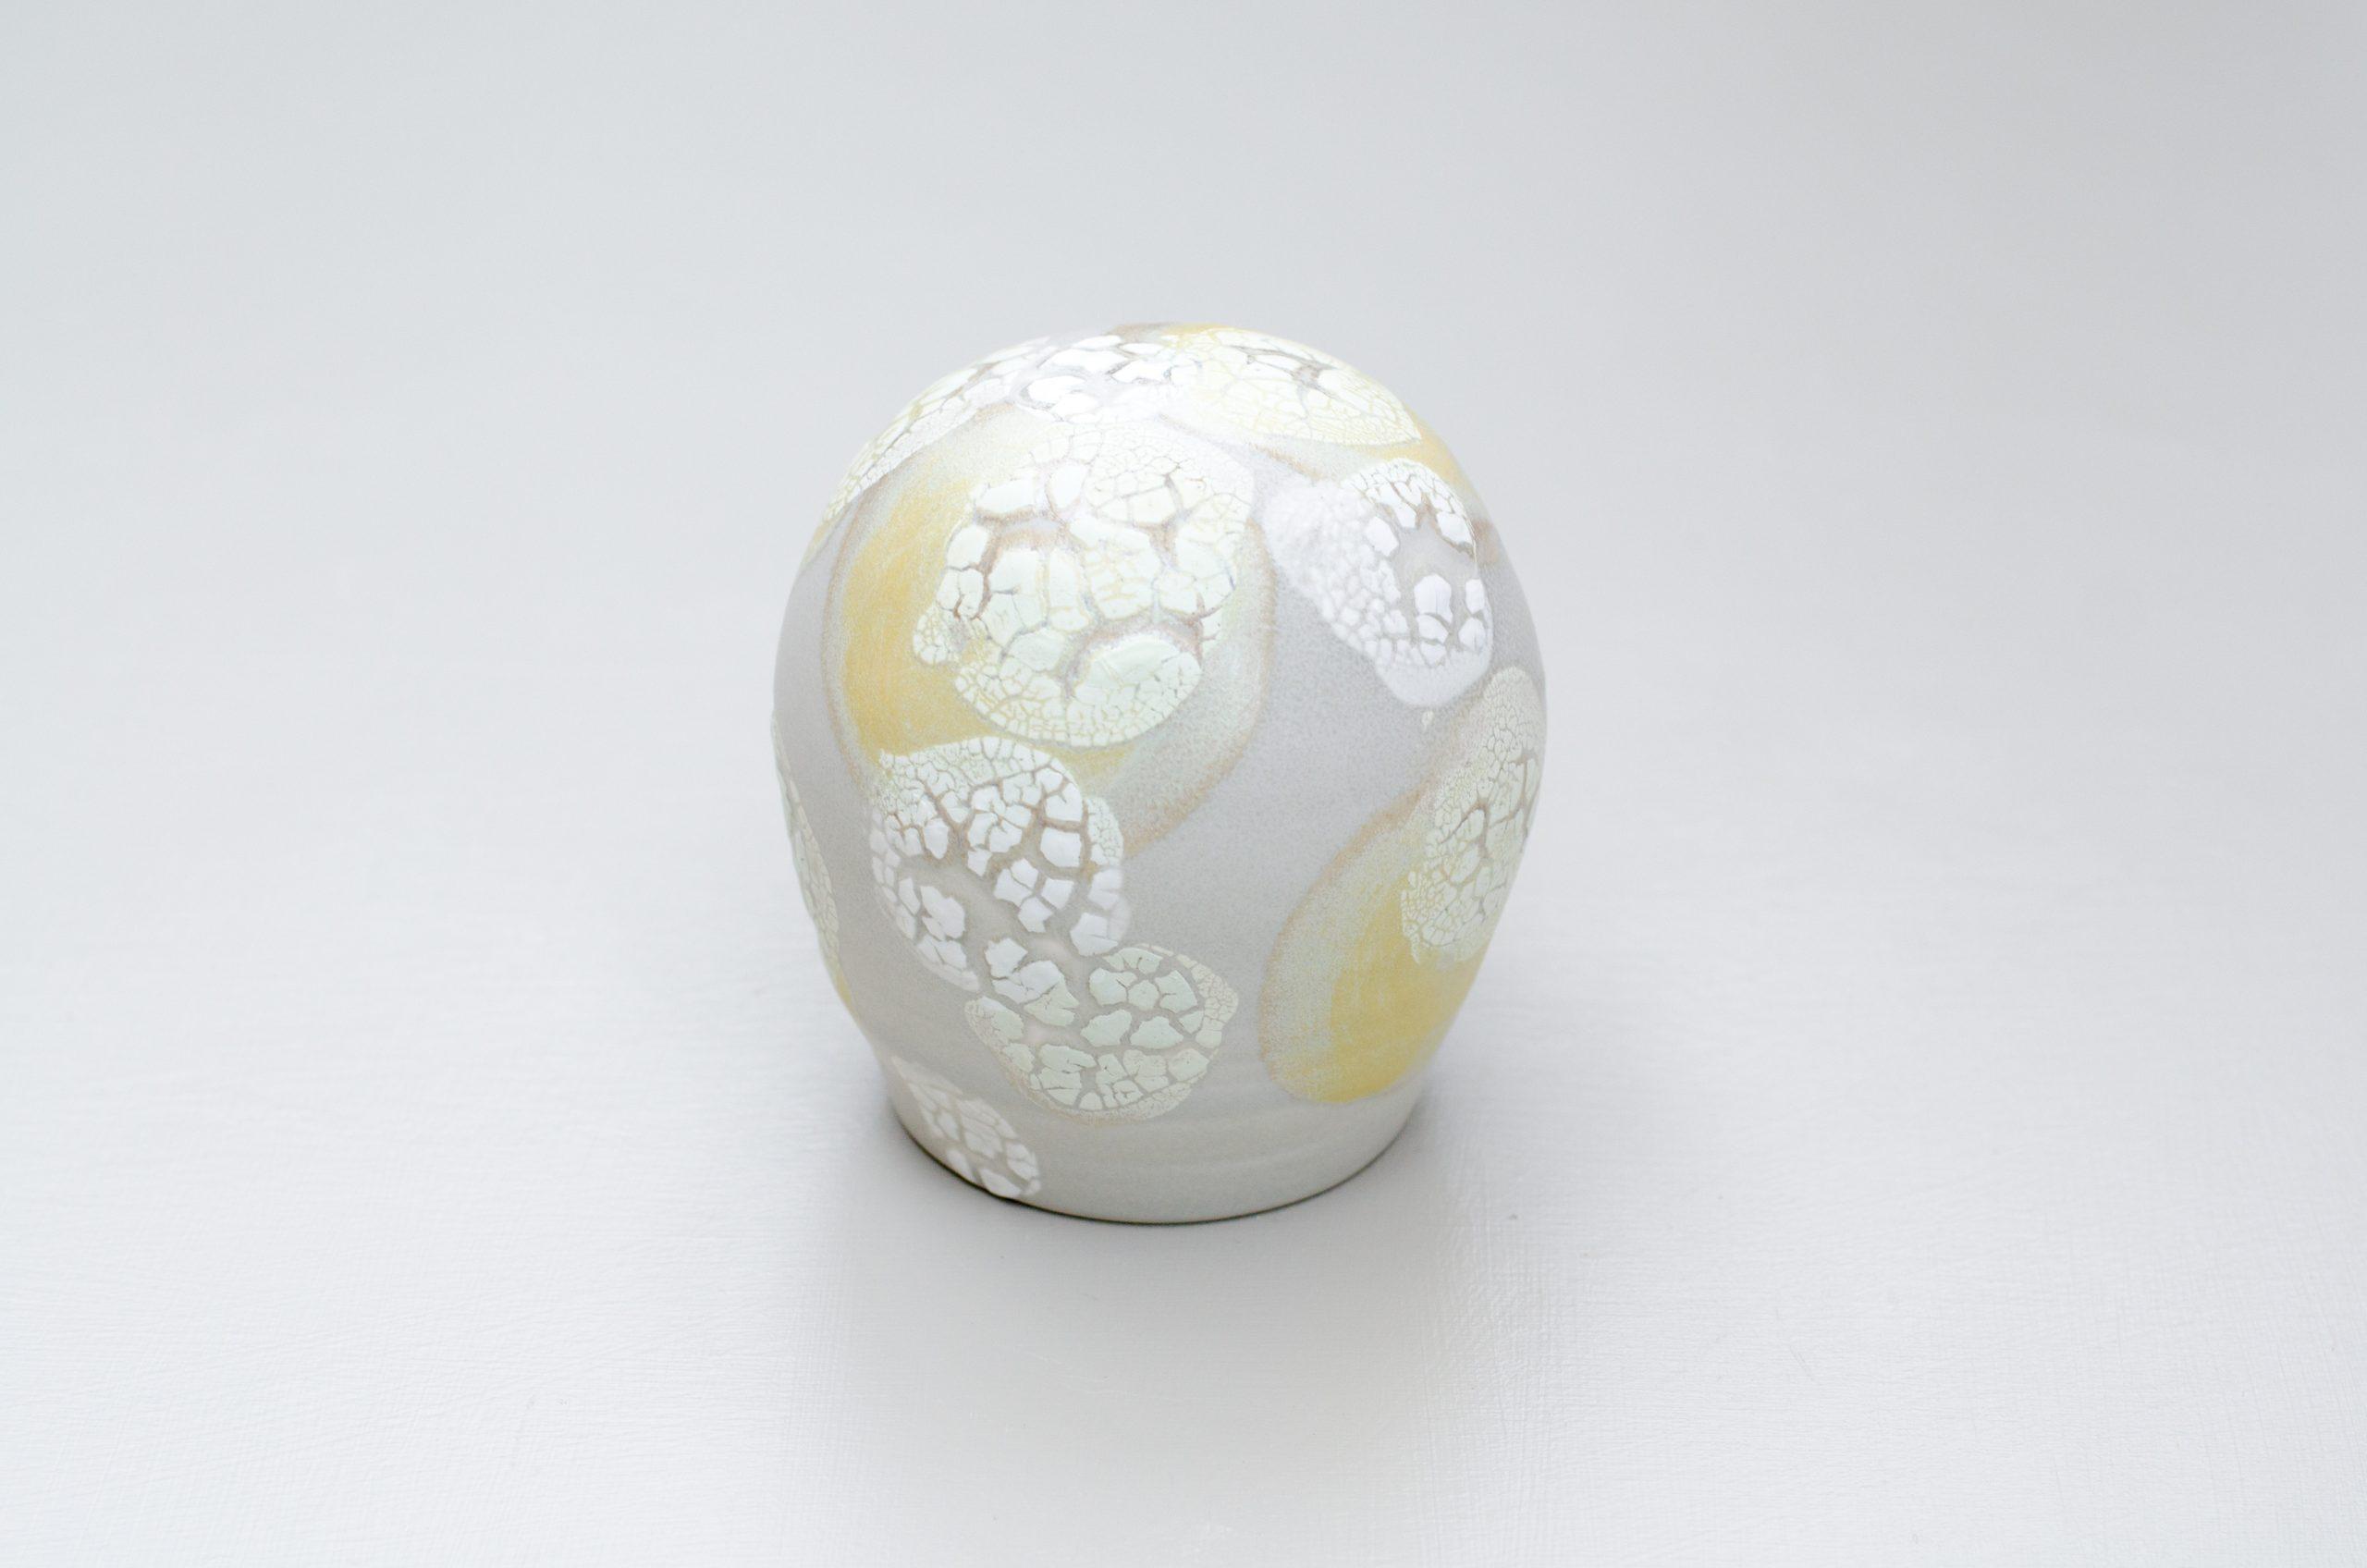 Lichen-glazed porcelain sculptural form